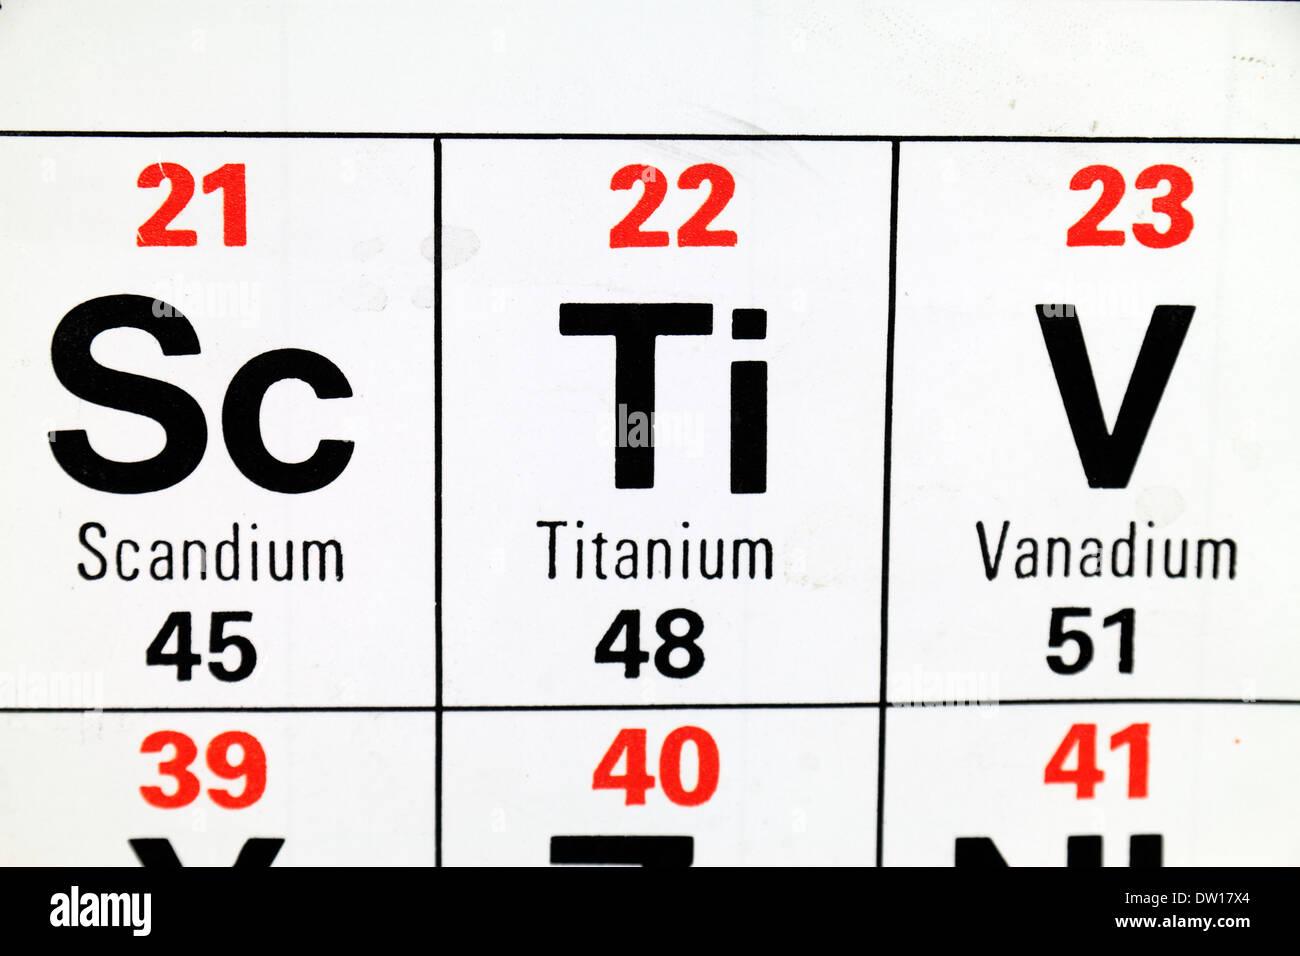 El titanio ti como aparece en la tabla peridica foto imagen de el titanio ti como aparece en la tabla peridica urtaz Choice Image